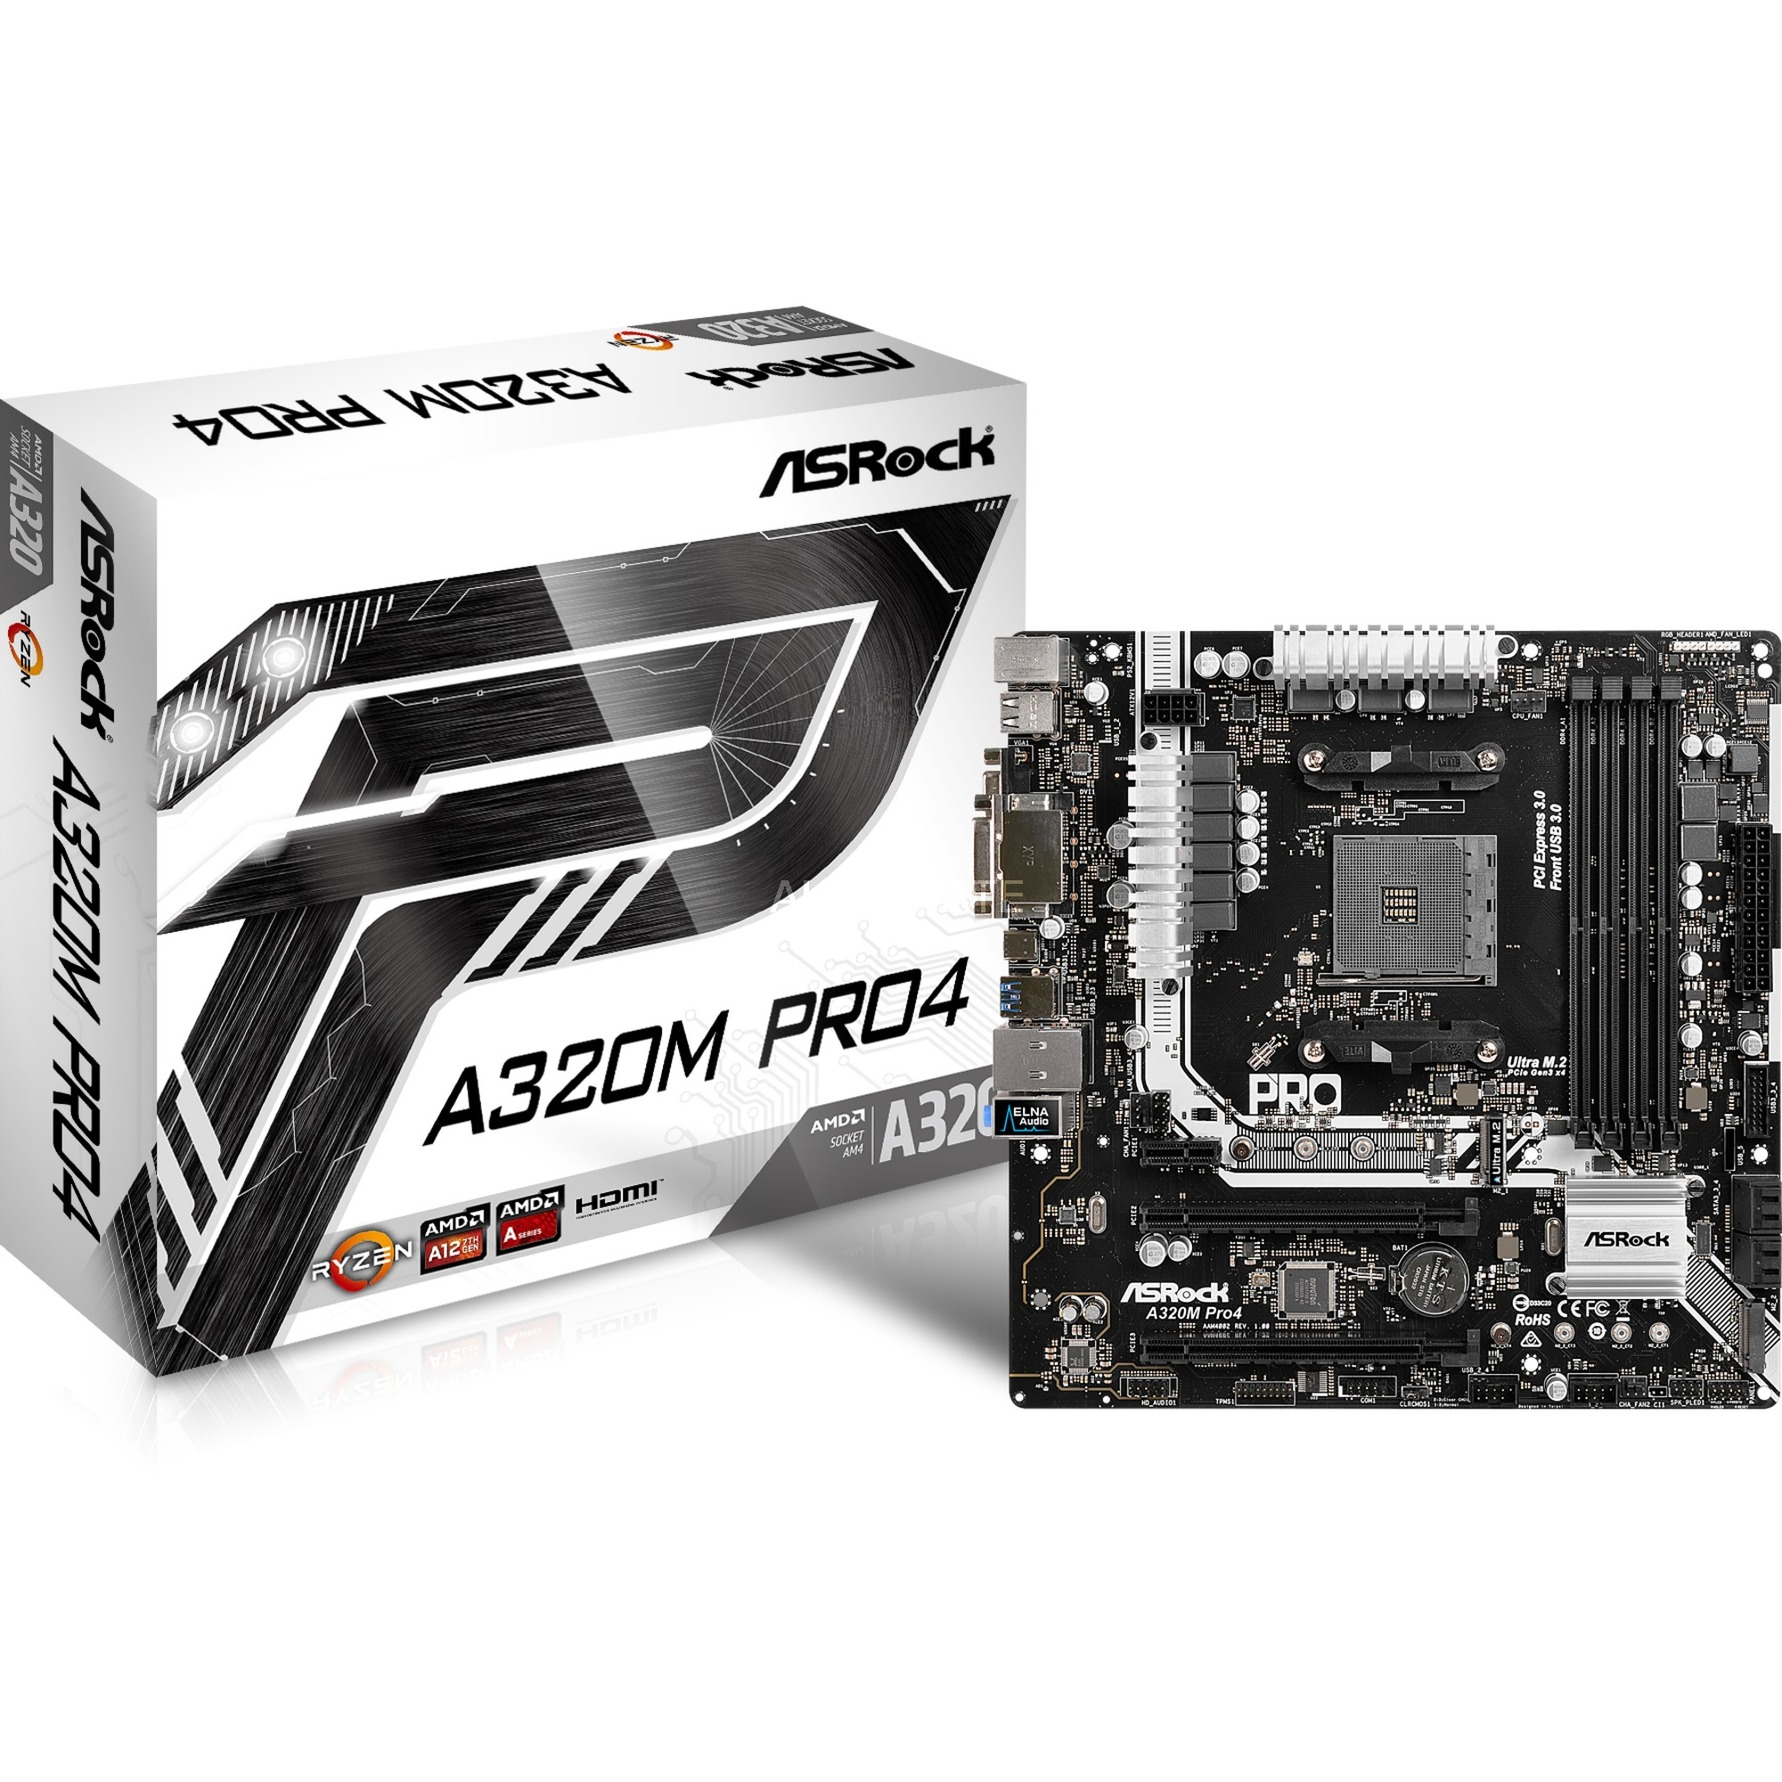 A320M Pro4 AMD A320 Socket AM4 Micro ATX placa base